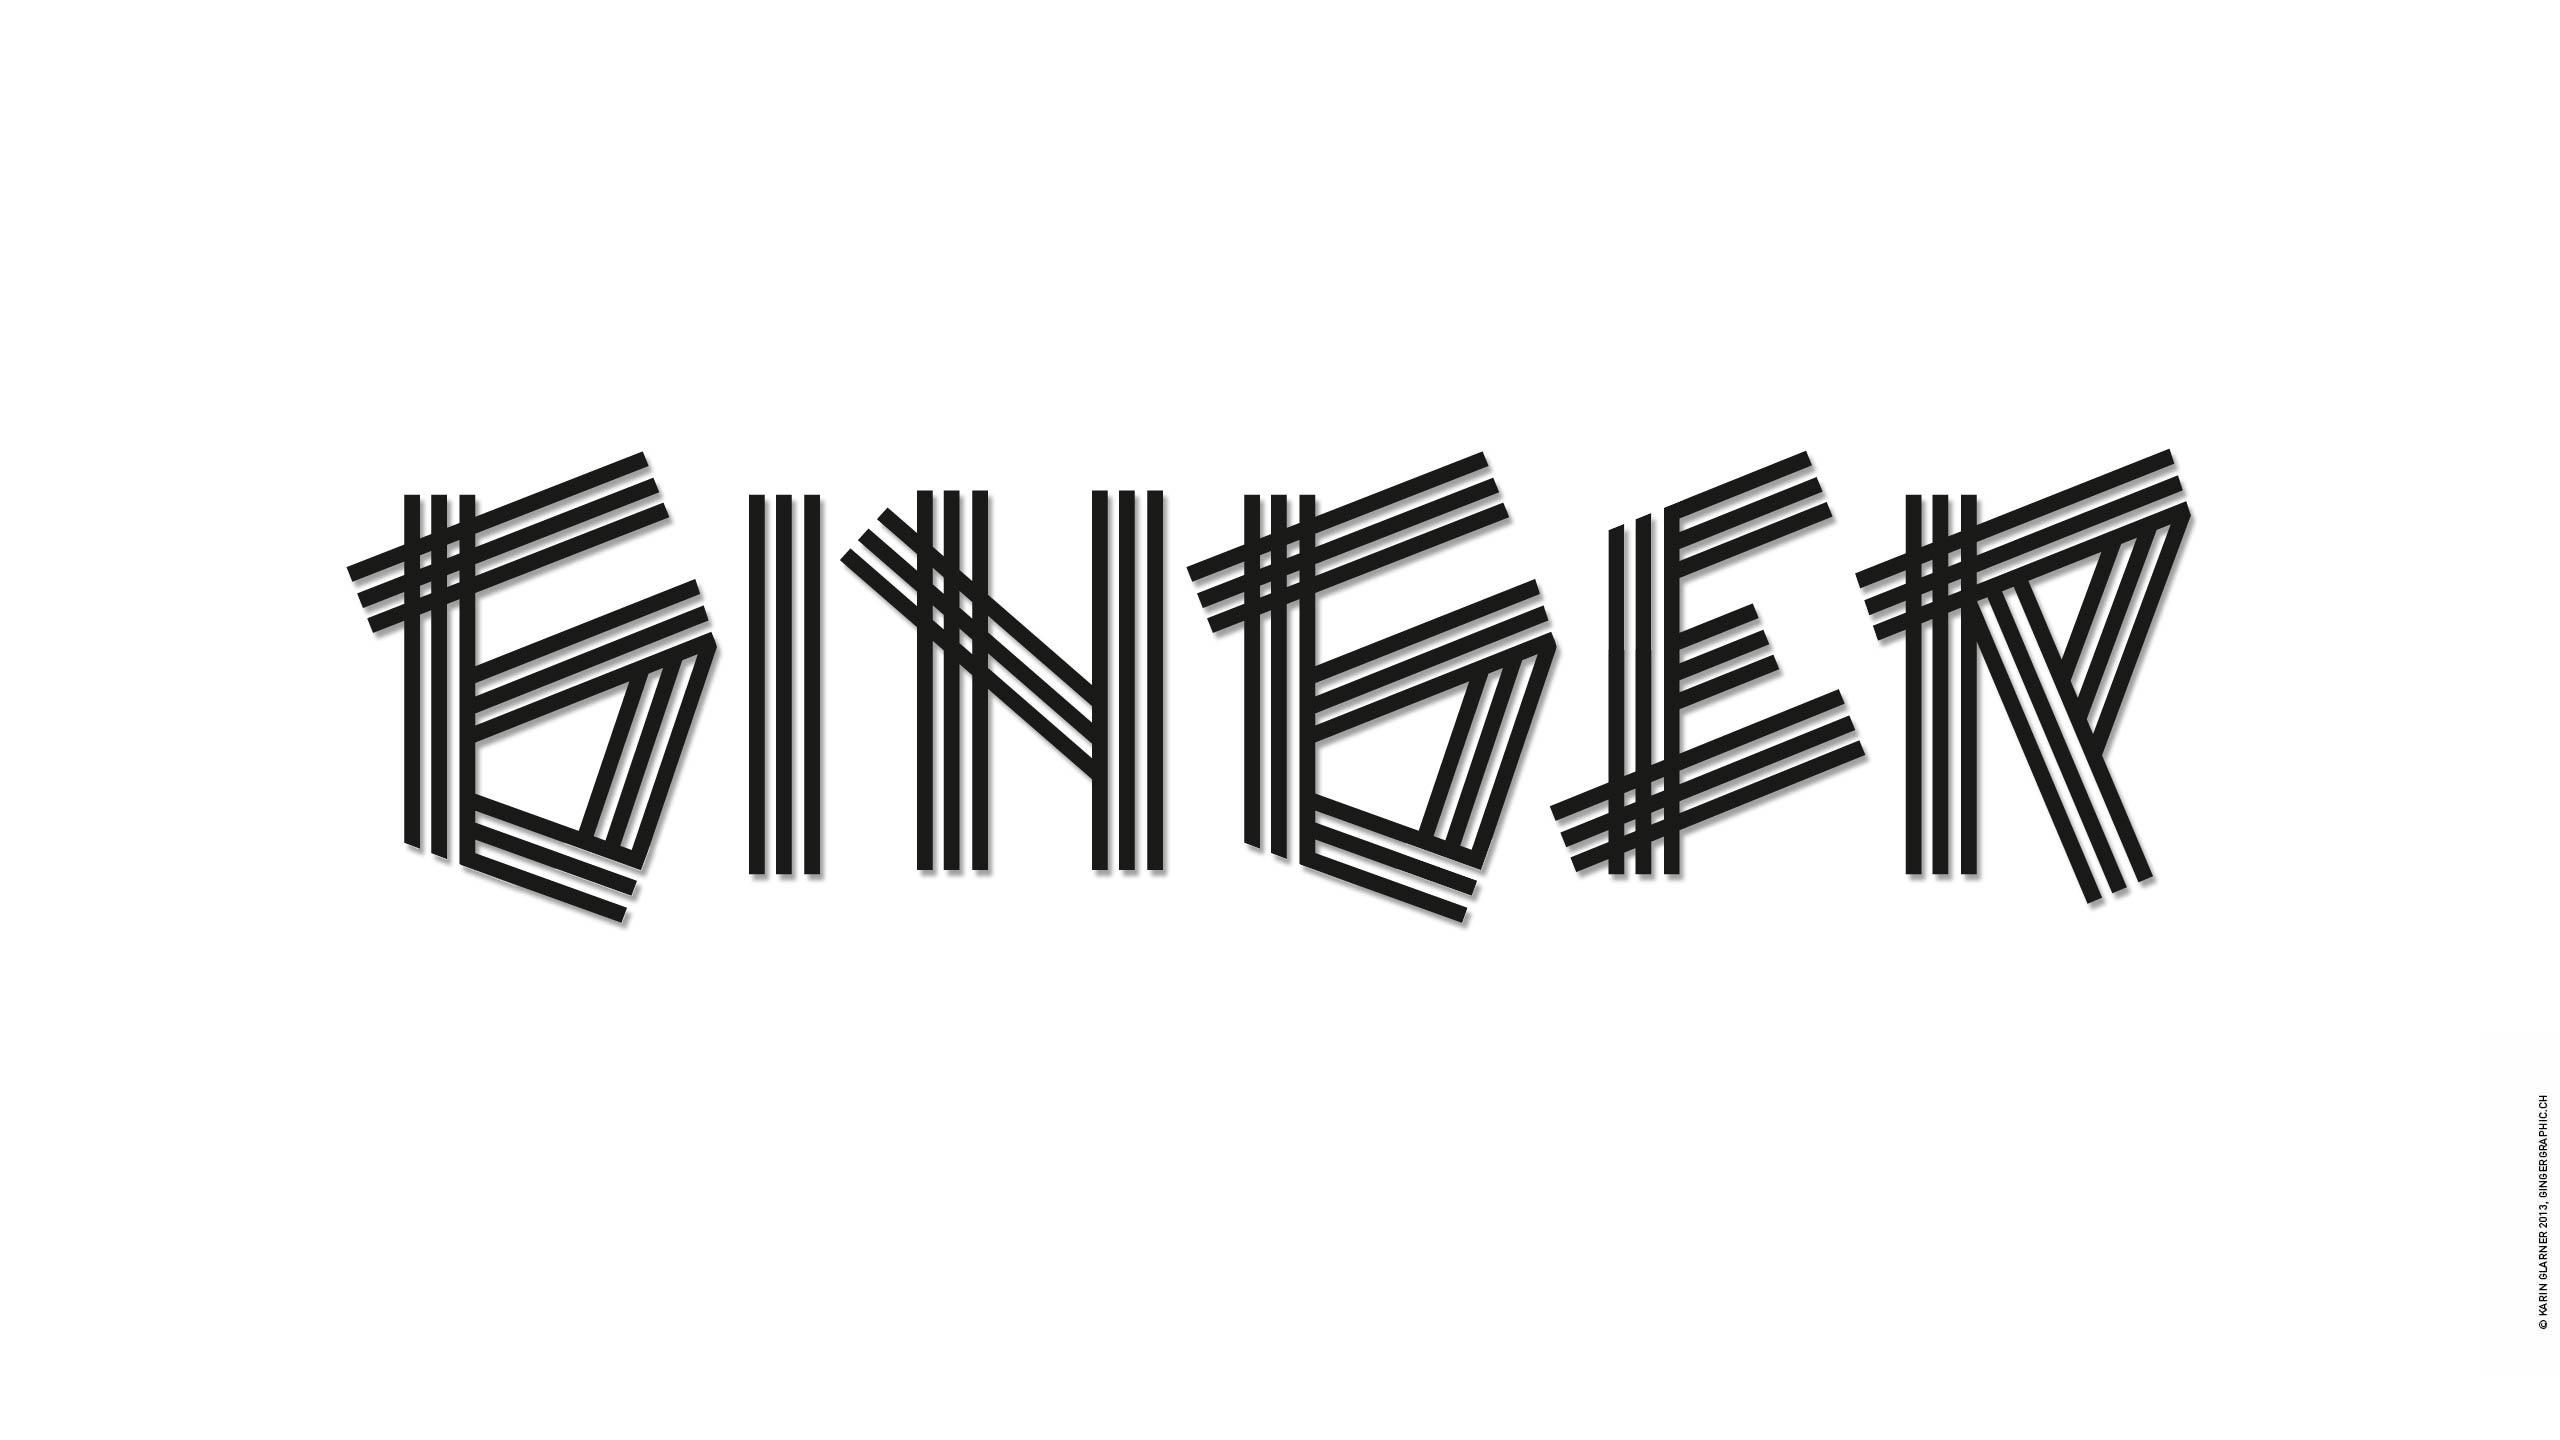 a07_typo_ginger_copyrightkglarner